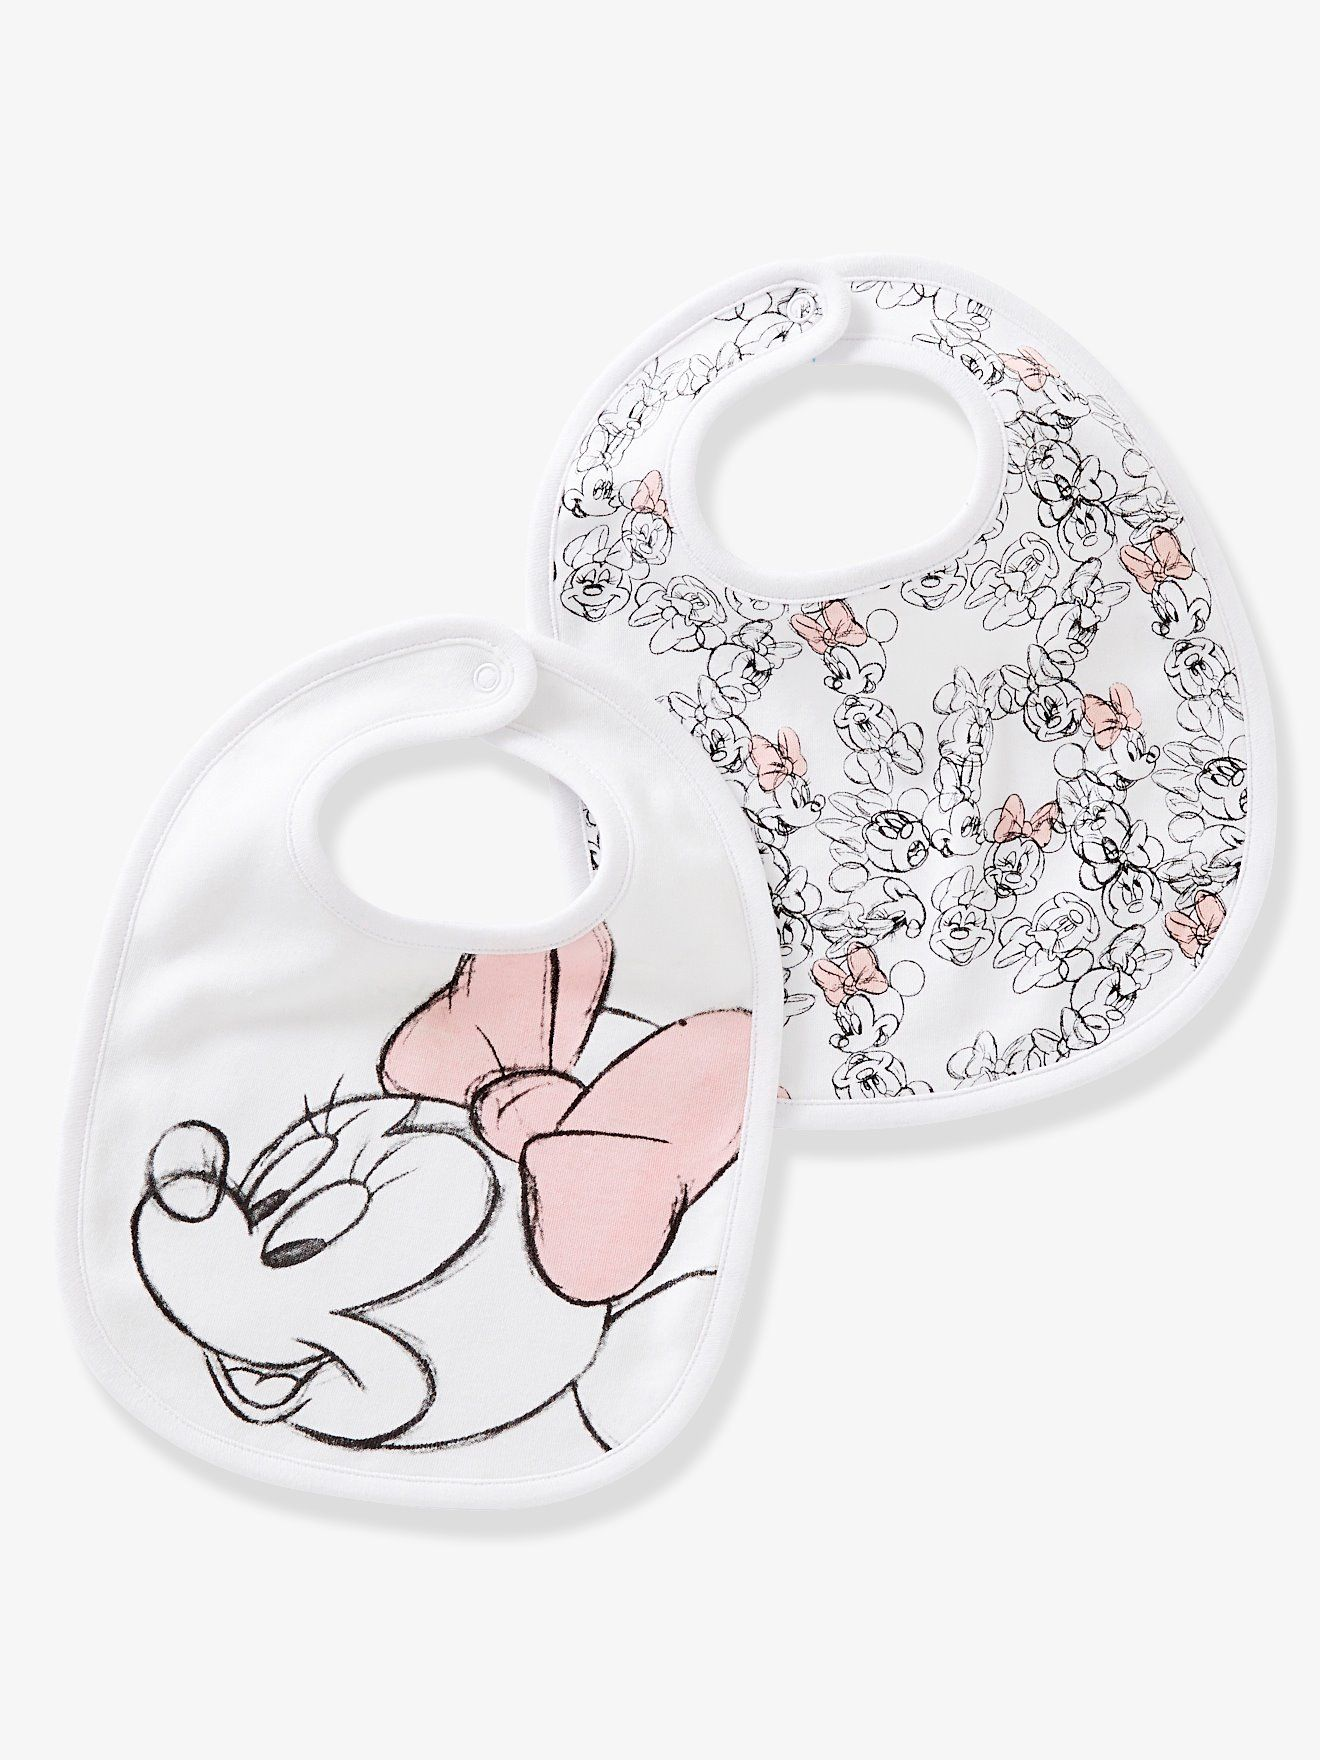 d33d940e2d564 Lot de 2 bavoirs bébé Minnie® imprimés - assortis blanc | Vertbaudet ...